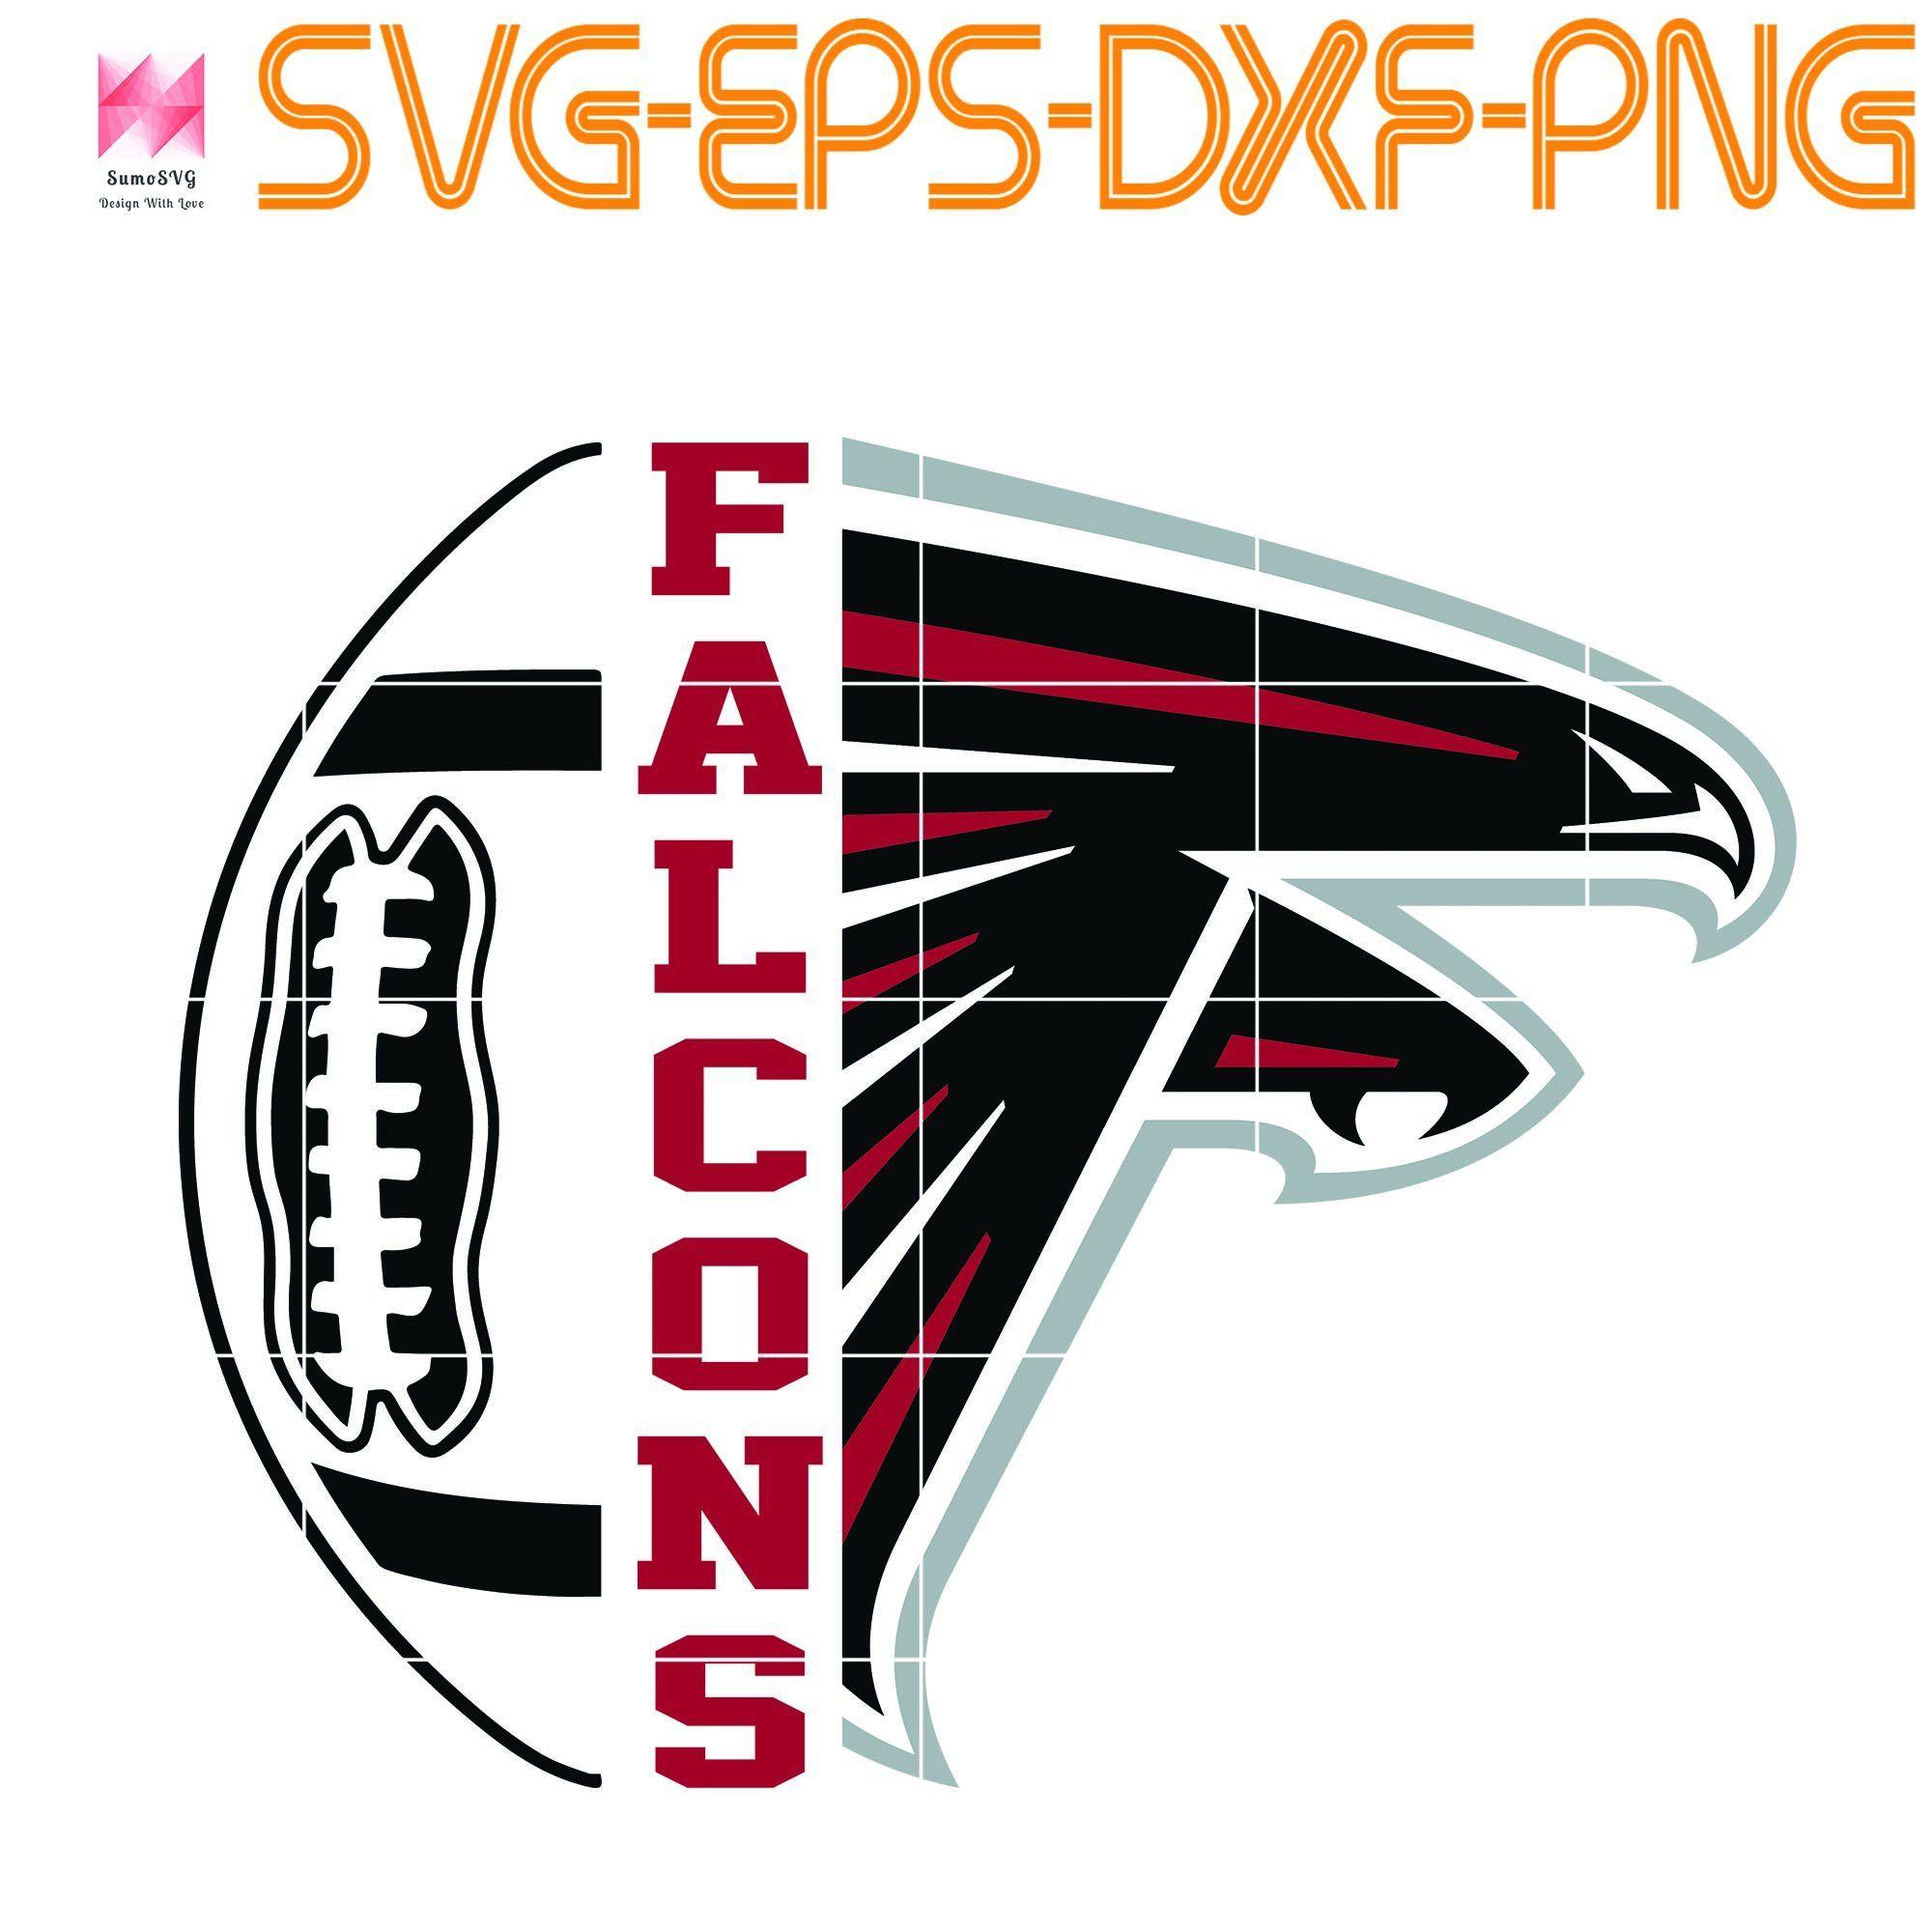 Atlanta Falcons Svg Falcons Girl Svg Falcons Svg Falcons Boy Svg Nfl Svg Football Svg Falcons Mom Svg Dna Fueled By Haters Lip Skull Svg Eps Dxf In 2020 Atlanta